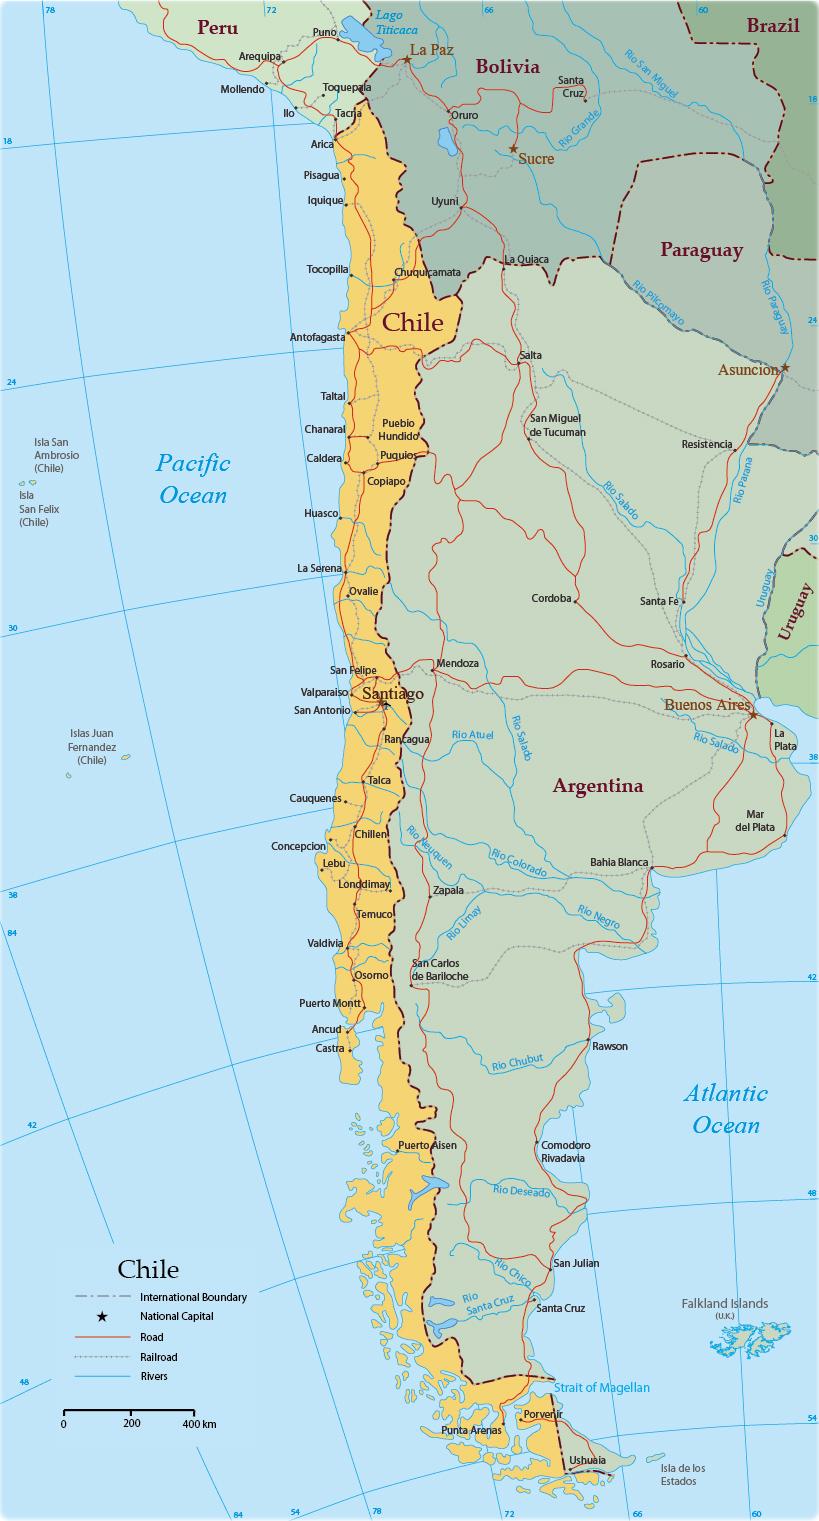 Chile Map on tierra del fuego map, punta arenas map, united states map, ecuador map, china map, peru map, south america map, japan map, quebec map, pacific ocean map, benin map, panama map, australia map, central america map, cameroon map, france map, colombia map, algeria map, croatia map, eritrea map, spain map, europe map, argentina map, bolivia map, libya map, angola map, aruba map, canada map, belgium map, egypt map, guatemala map, latin america map, cuba map, brazil map, columbia map,